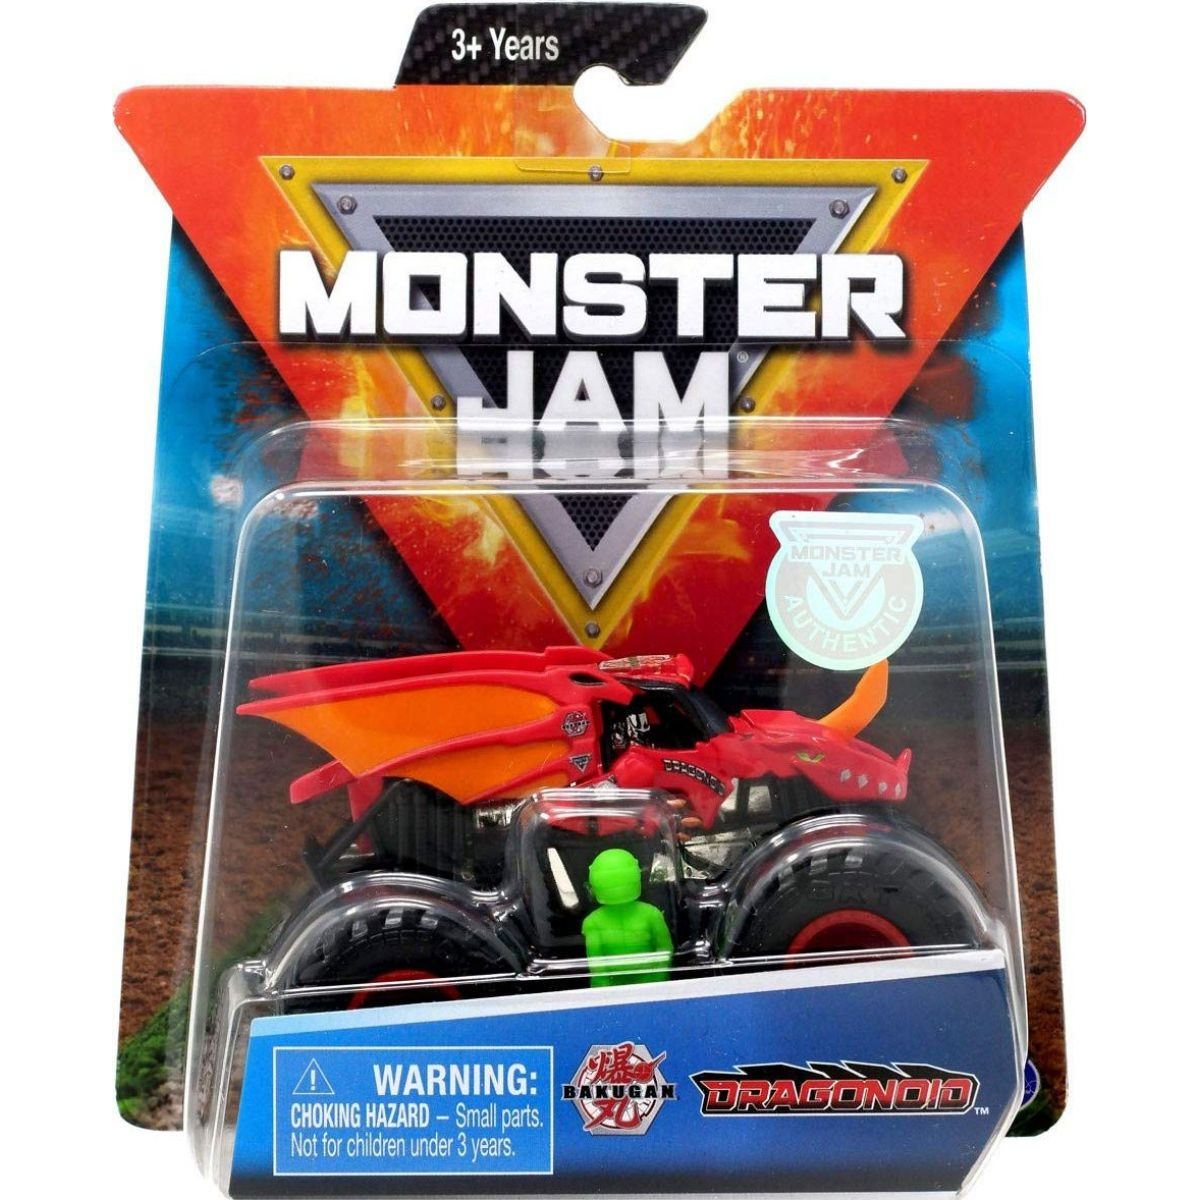 Monster Jam Sběratelská Die-Cast auta 1:64 Bakugan Dragonoid